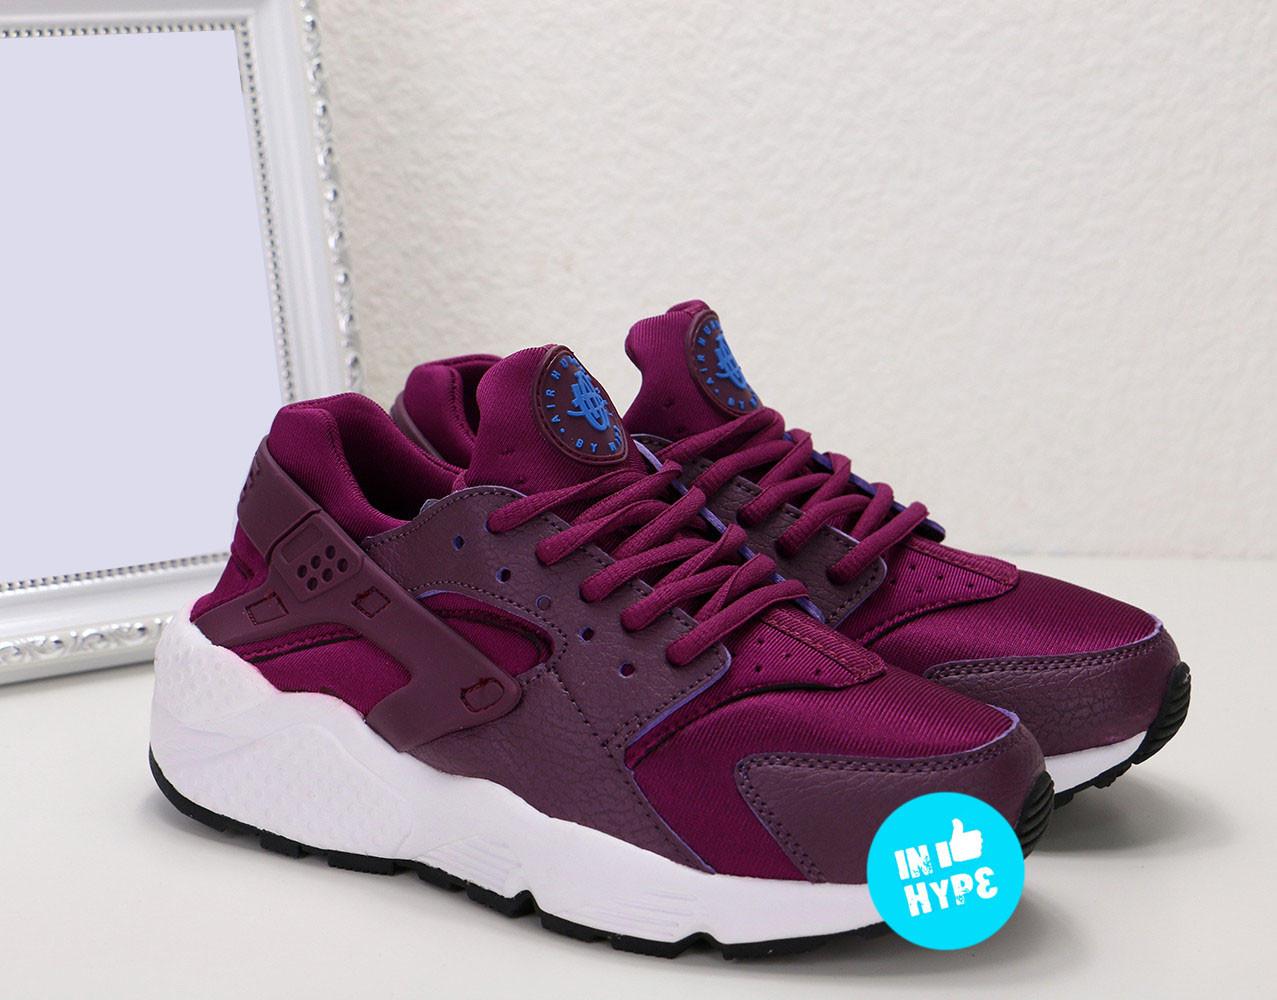 Кроссовки женские Nike Air Huarache purple   Найк Аир Хуараче пурпурные